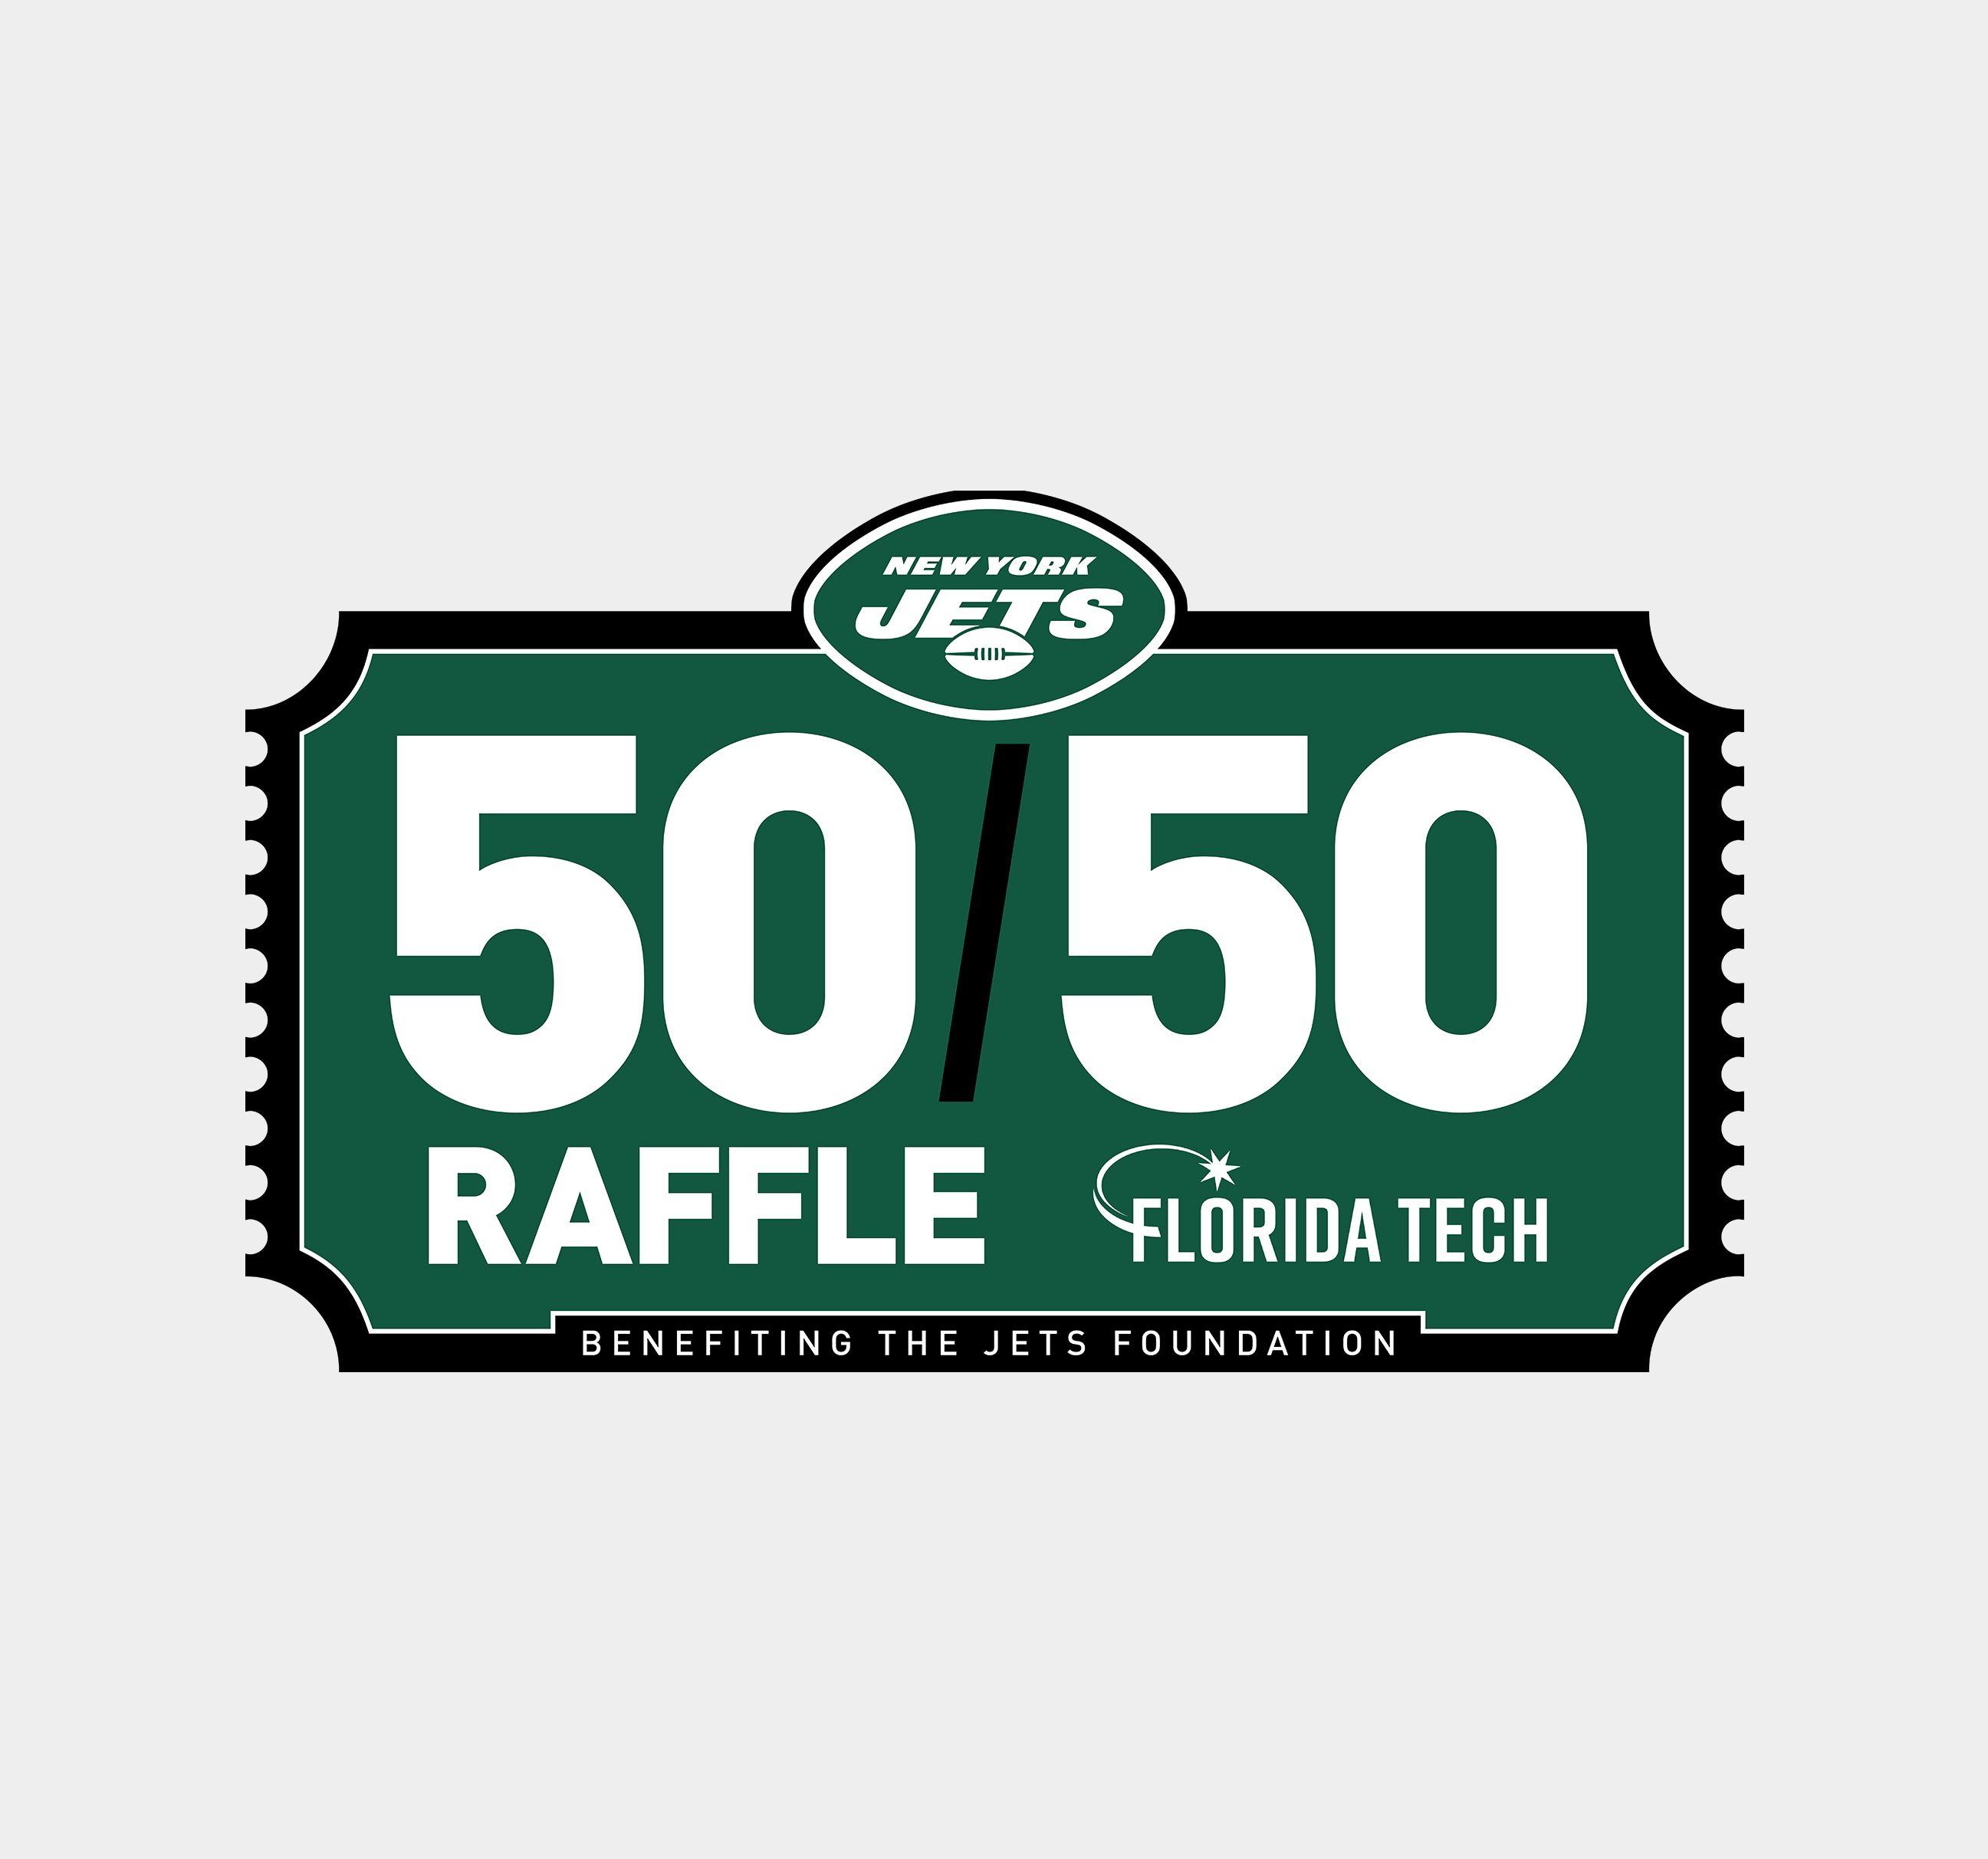 5050-Raffle-logo